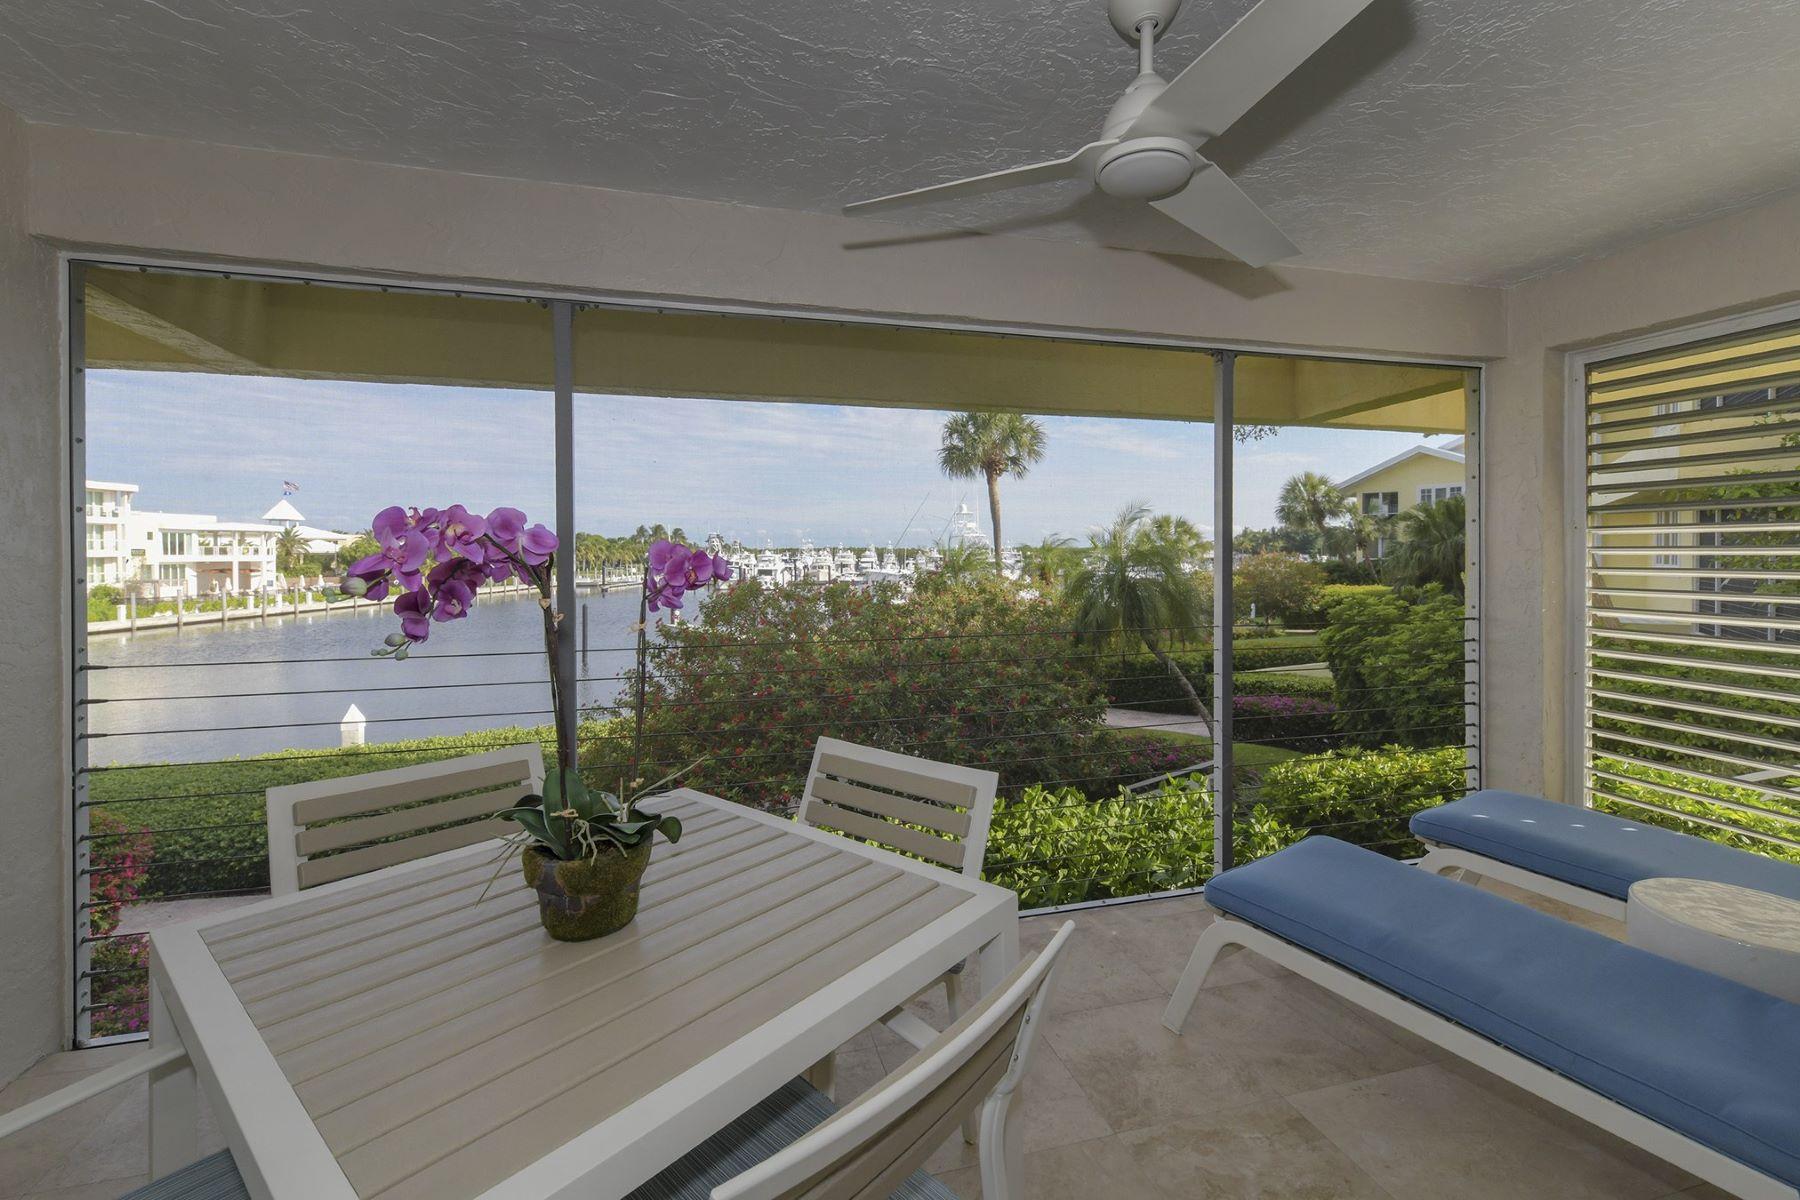 Condominiums for Sale at 10 Marina Drive, #A, Key Largo, FL 10 Marina Drive, A, Key Largo, Florida 33037 United States